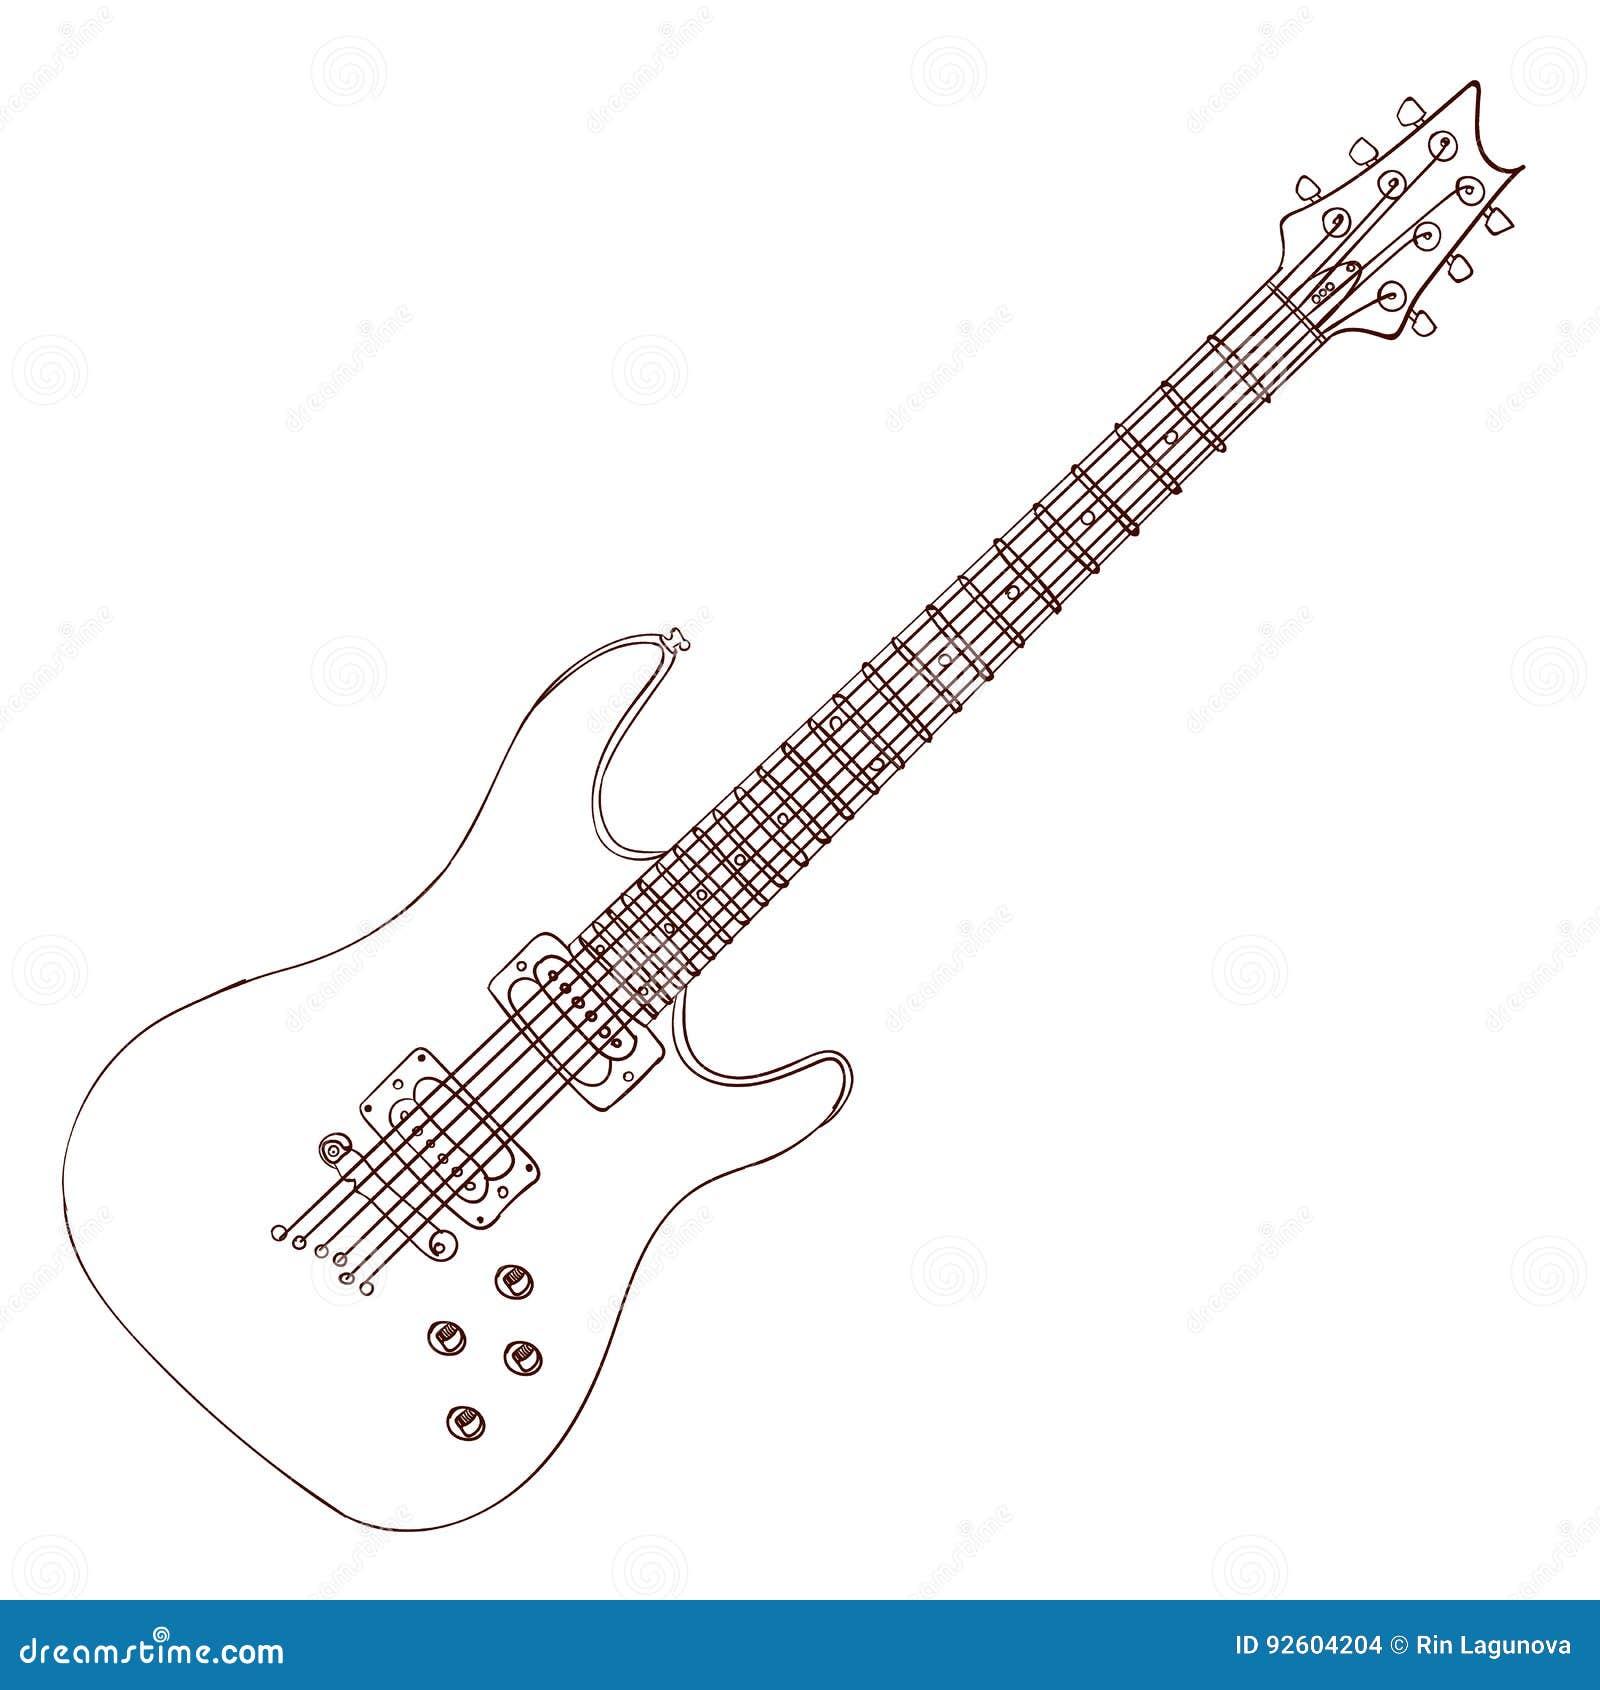 Beste Schaltplan Für E Gitarre Ideen - Schaltplan Serie Circuit ...